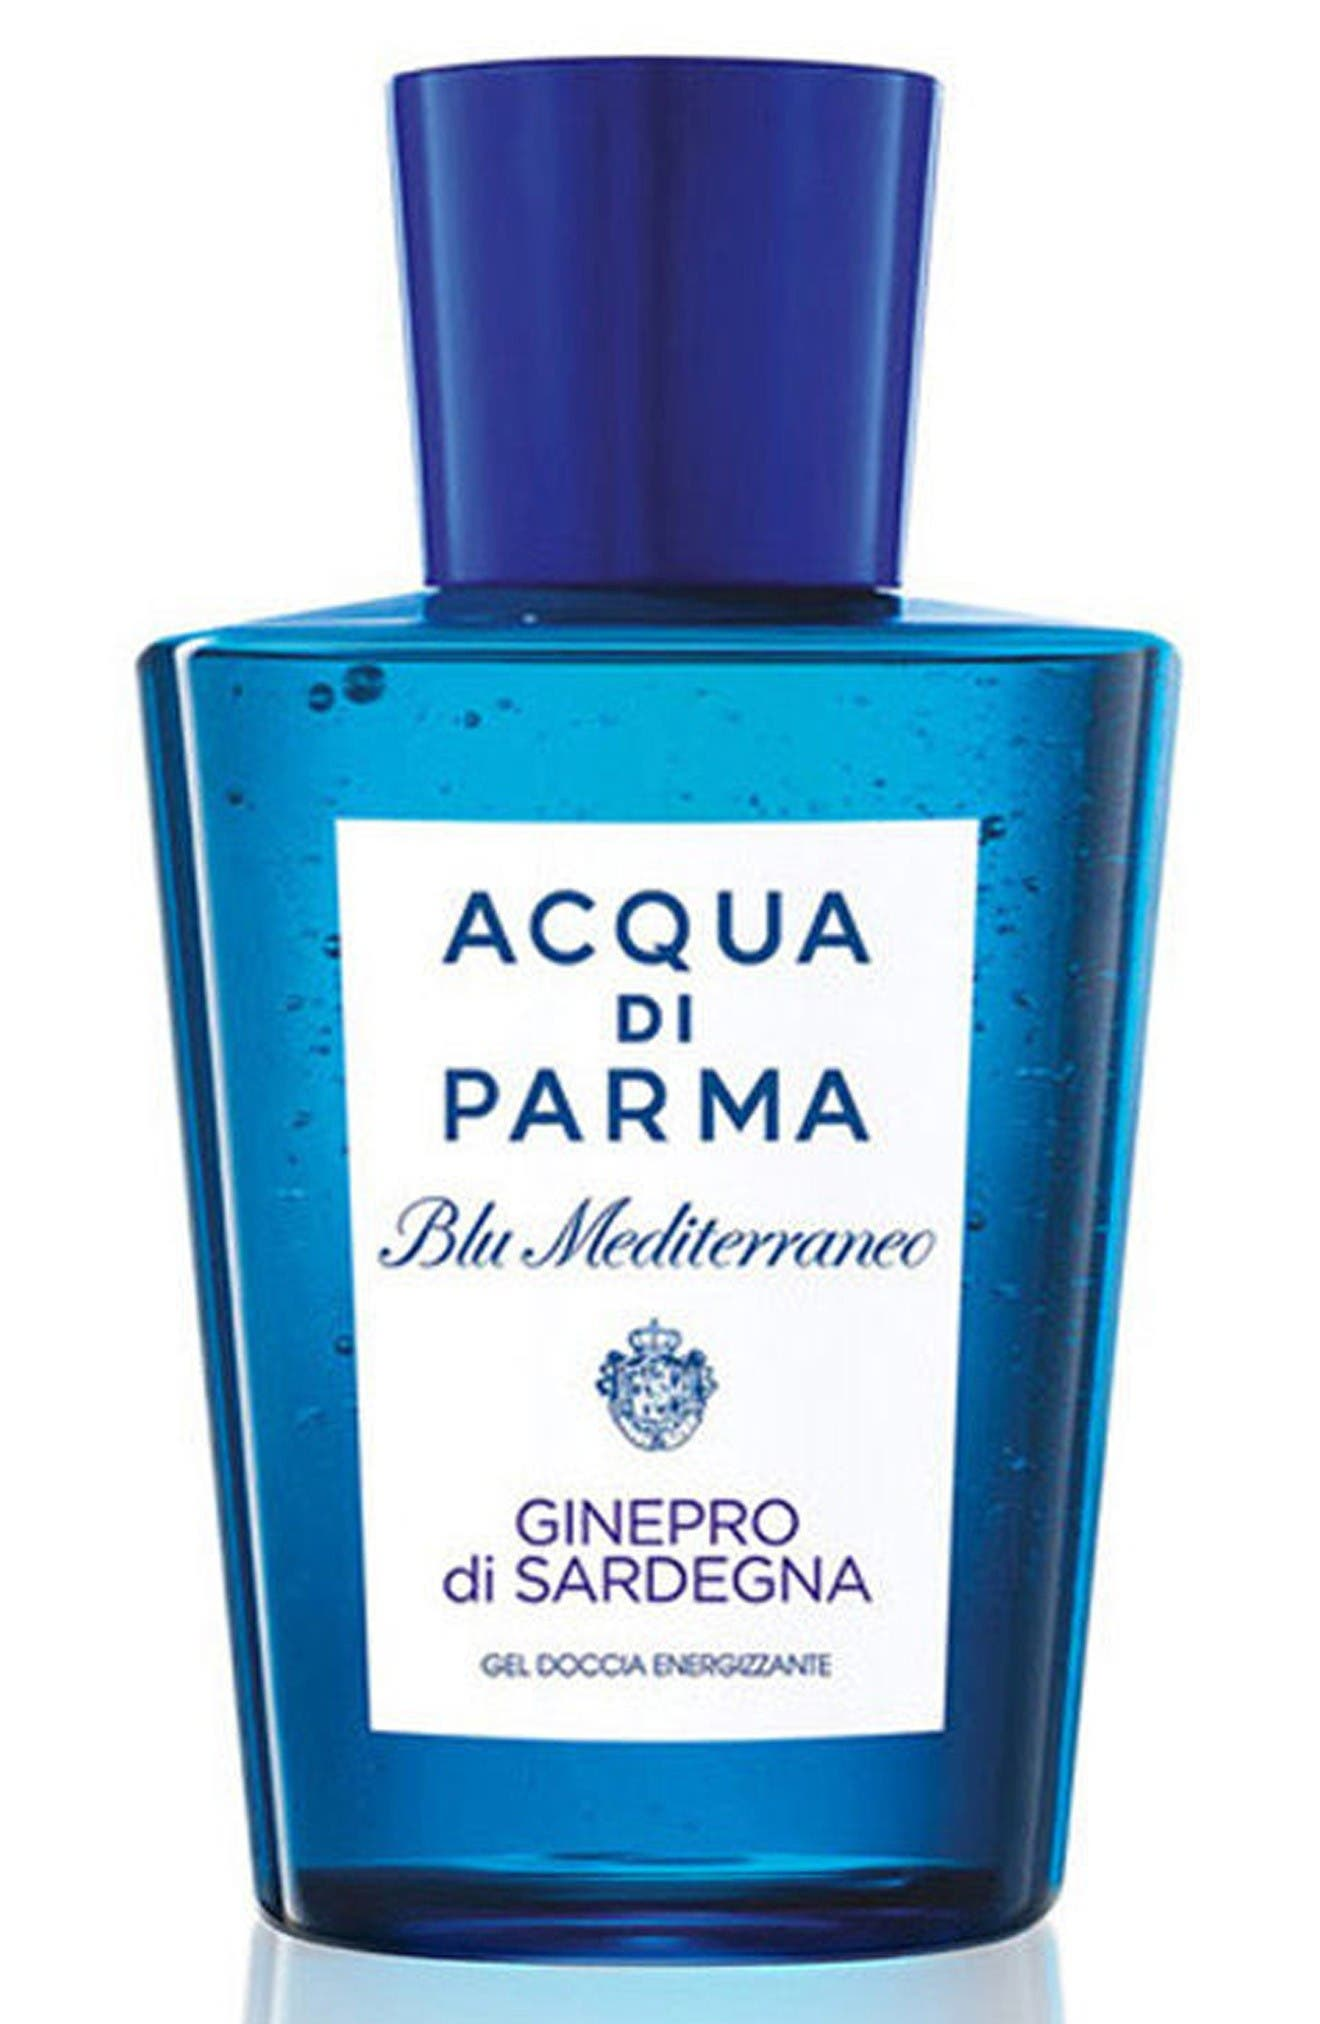 Alternate Image 1 Selected - Acqua di Parma 'Blu Mediterraneo - Ginepro di Sardegna' Energizing Shower Gel